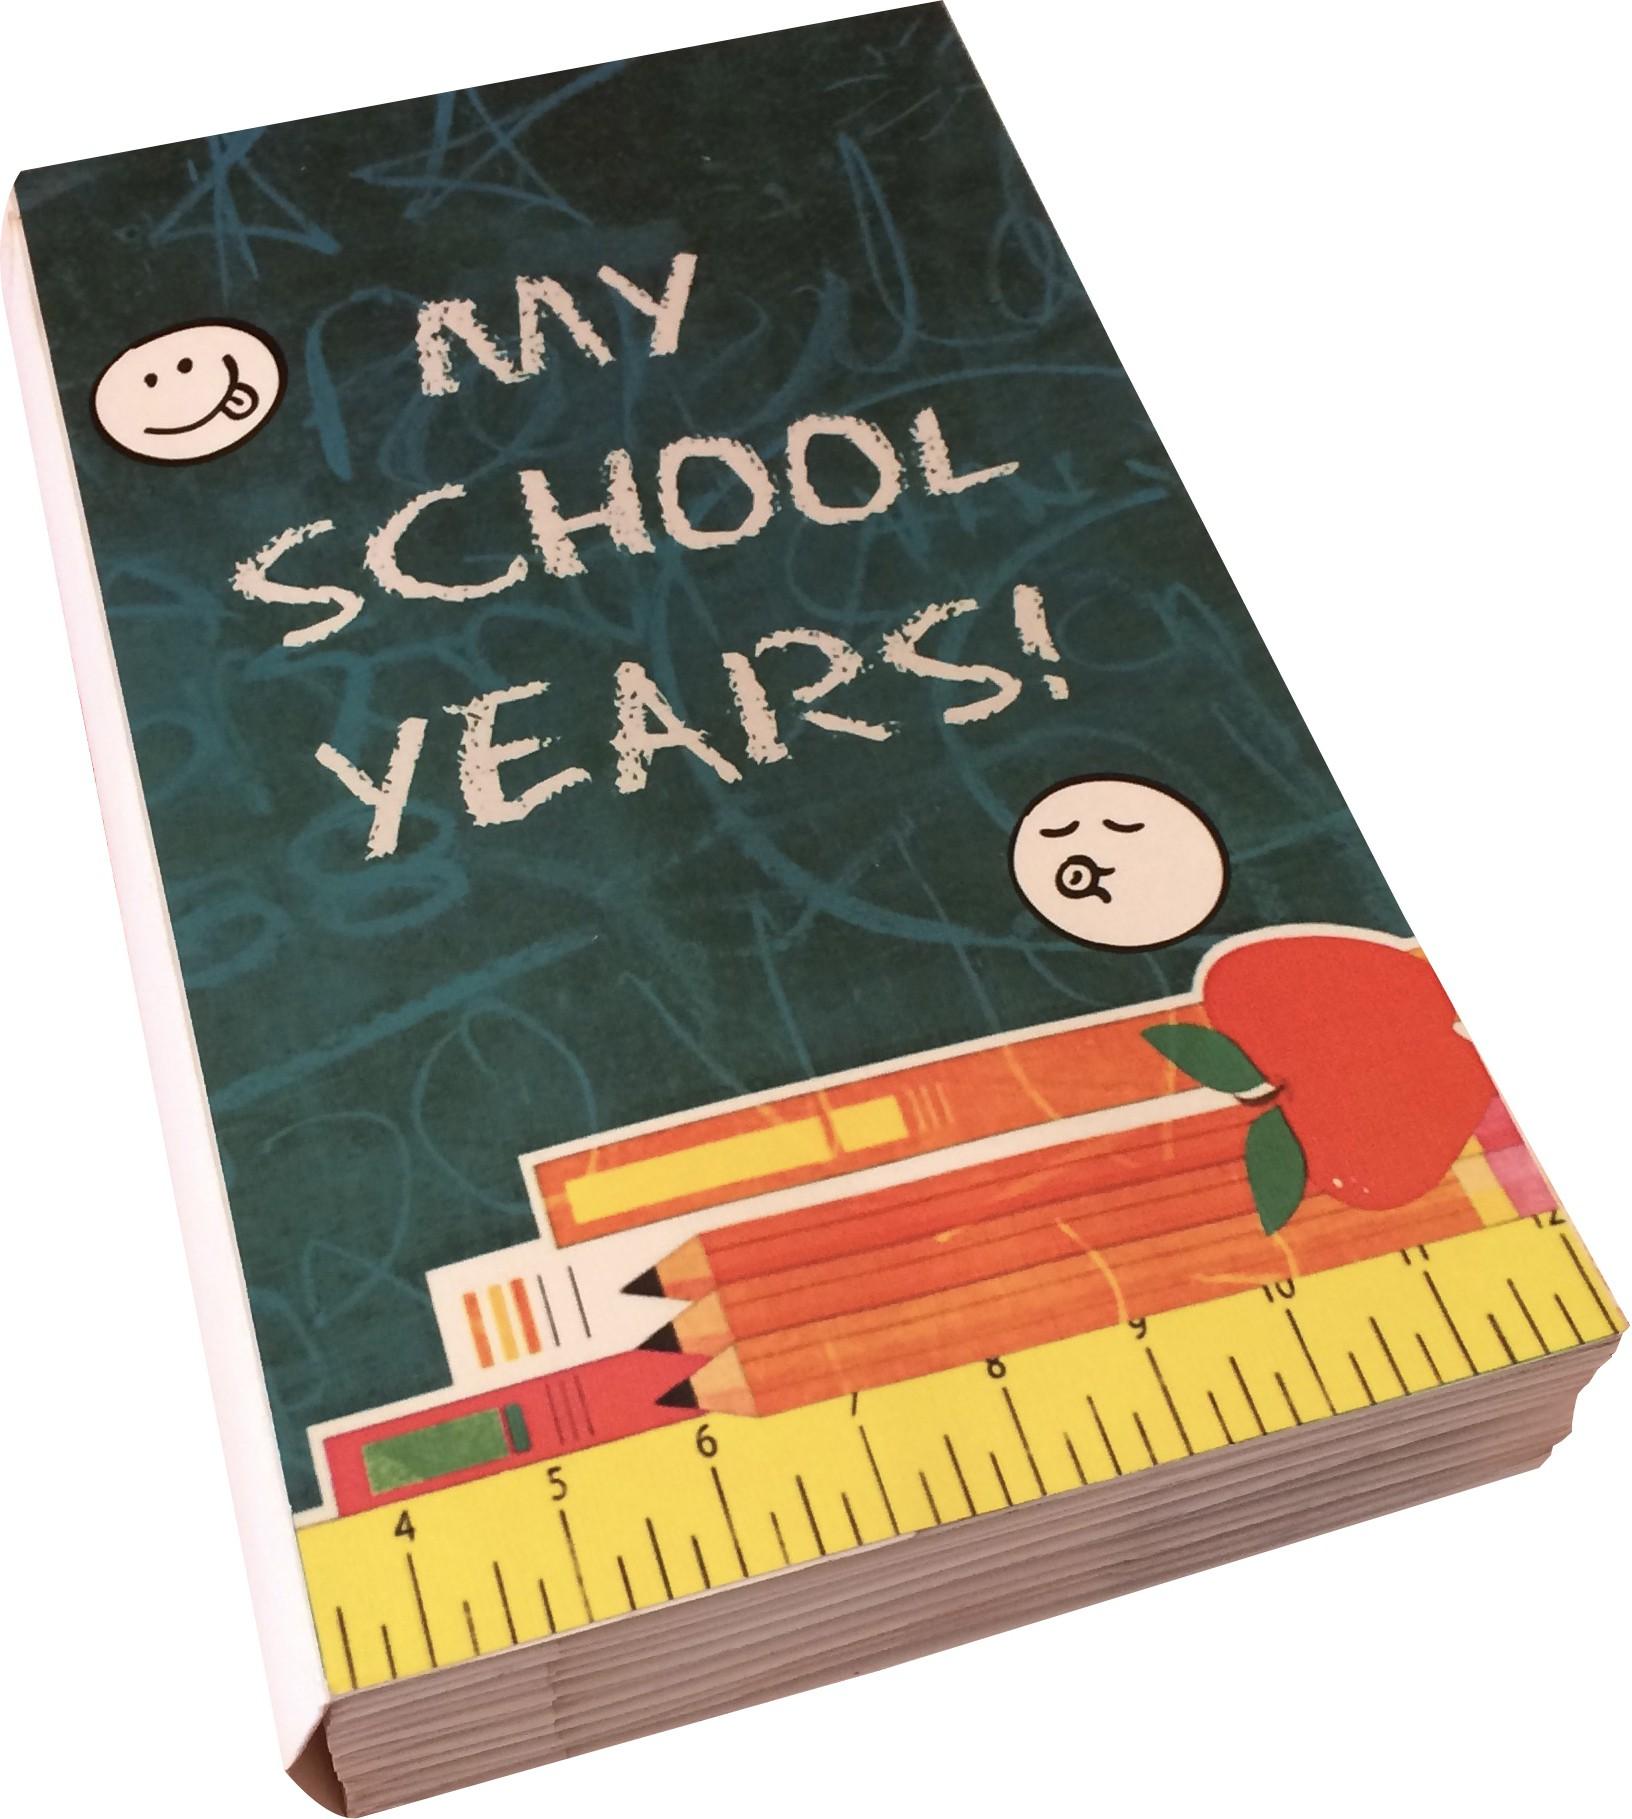 How to scrapbook school years - Crack Of Dawn Crafts My School Years Handmade